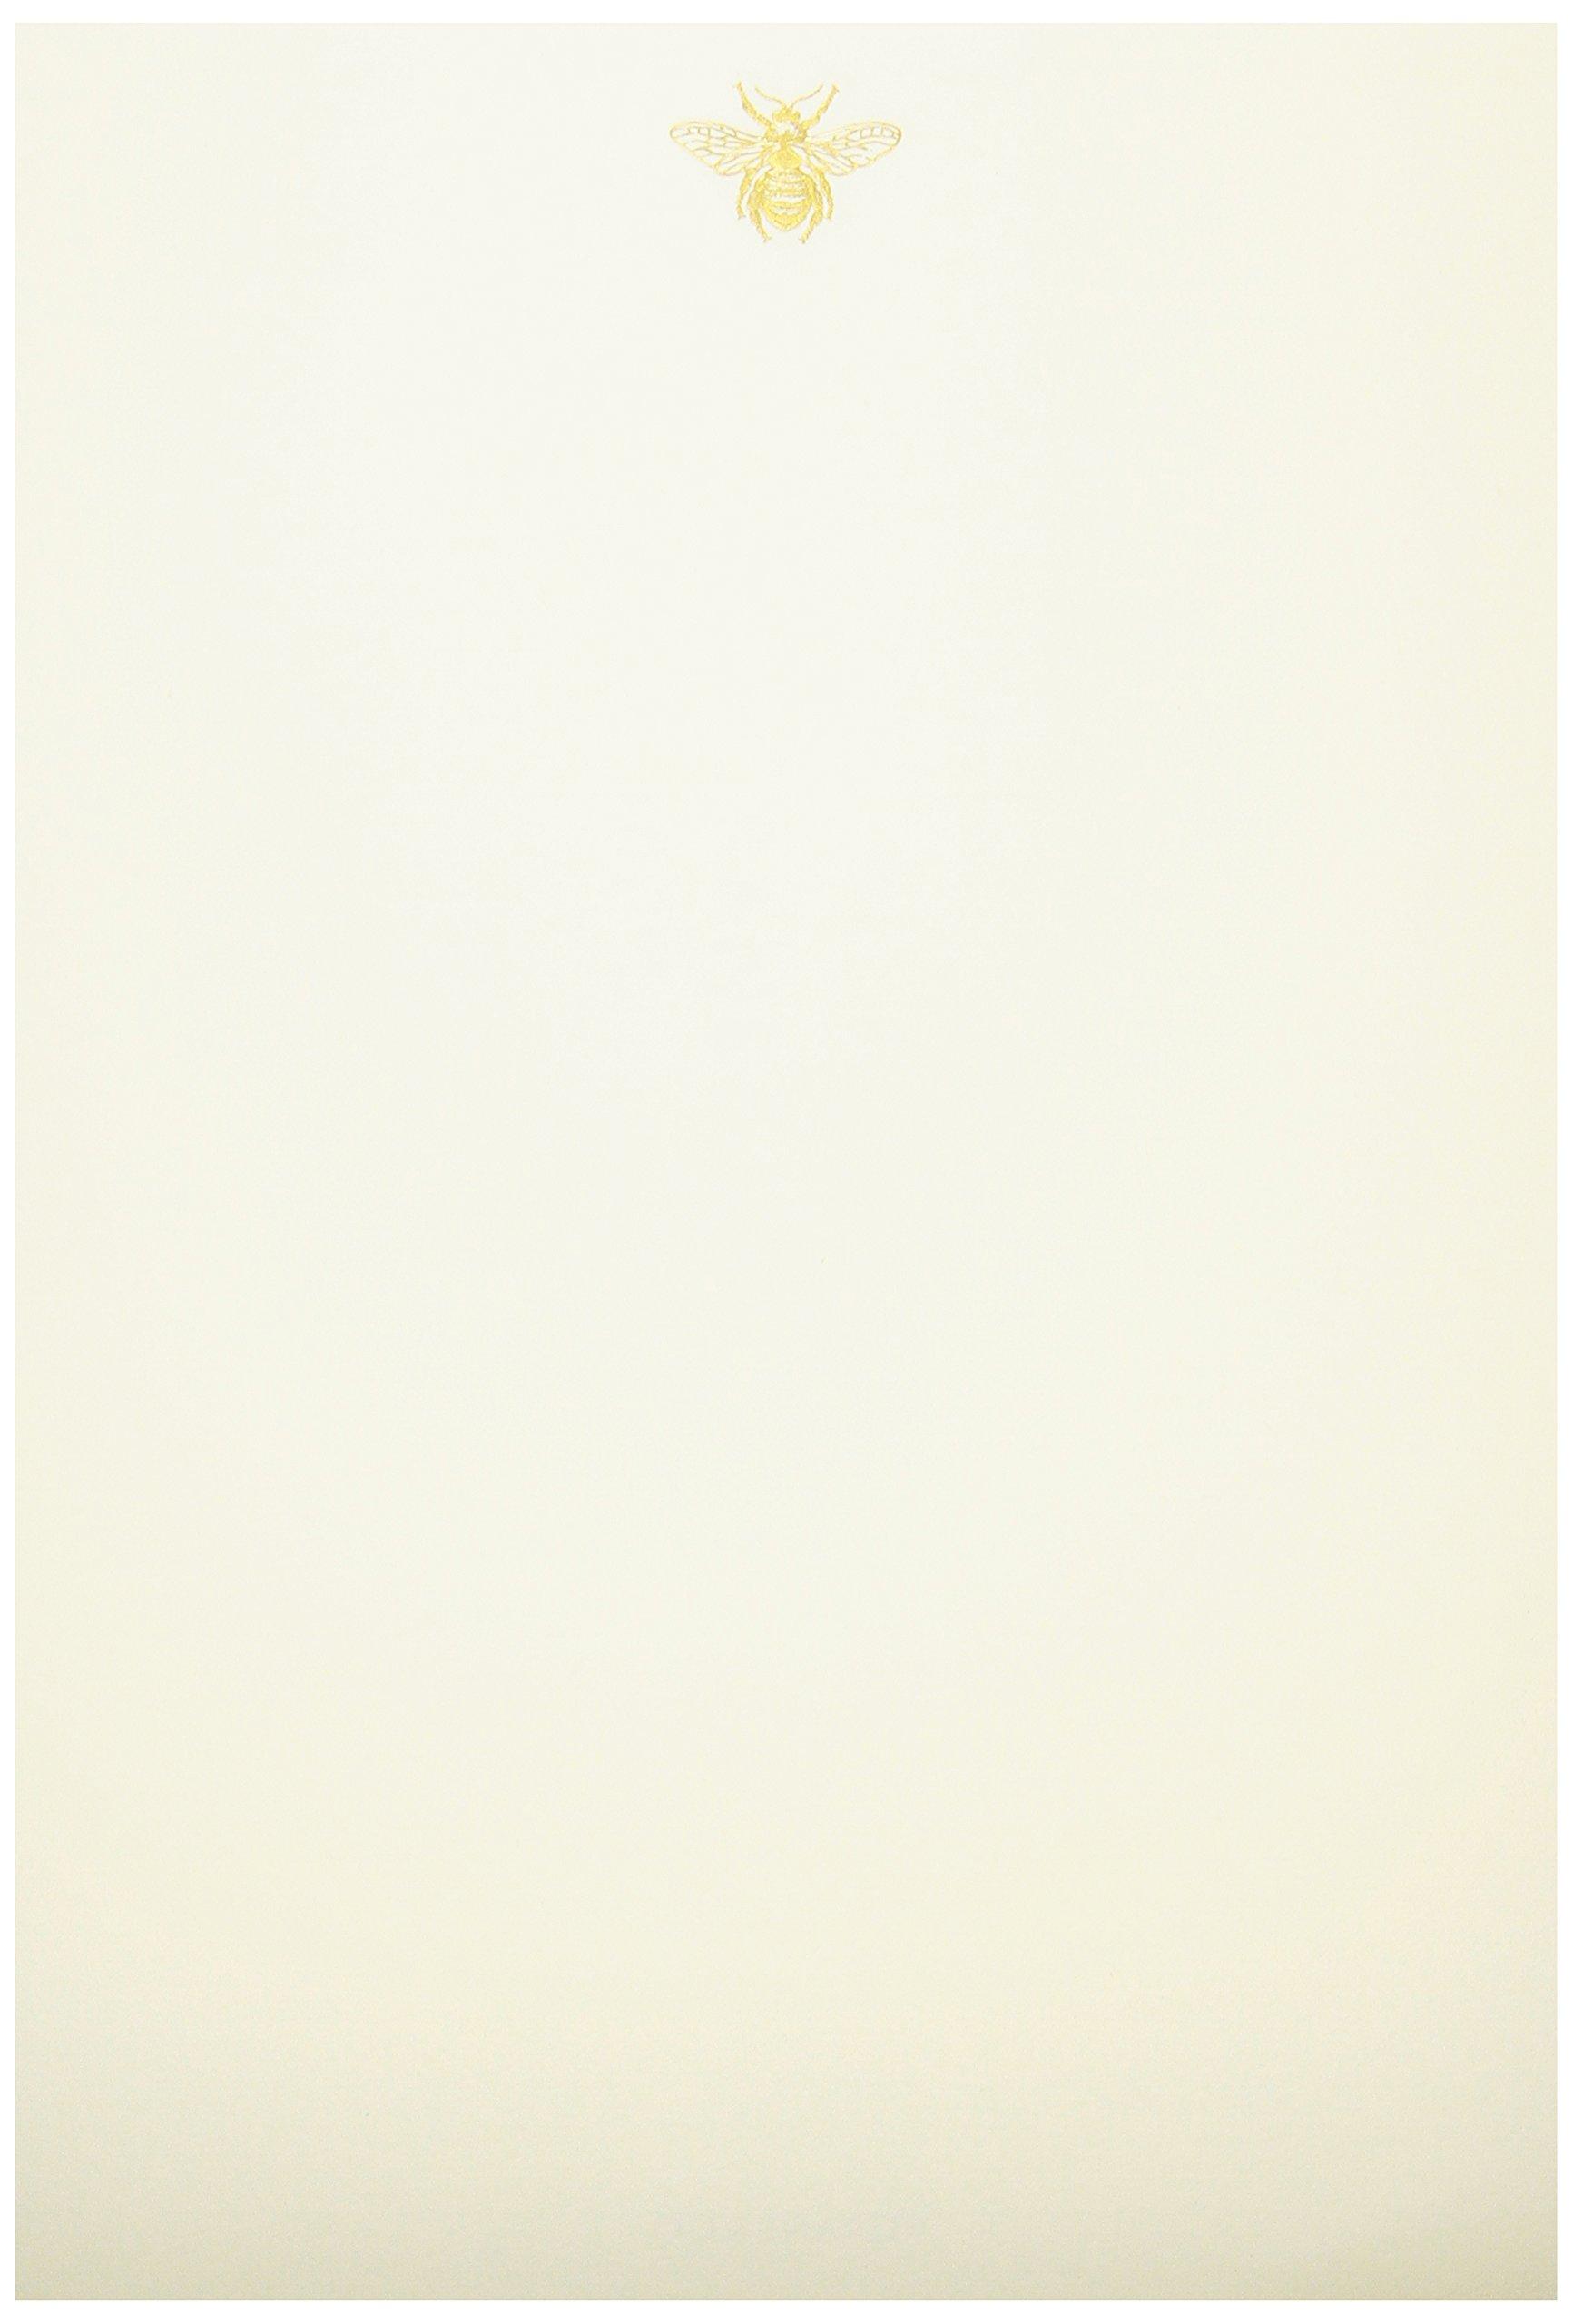 Crane & Co. Hand Engraved Bee Half Sheet (RH1400) by Crane & Co.